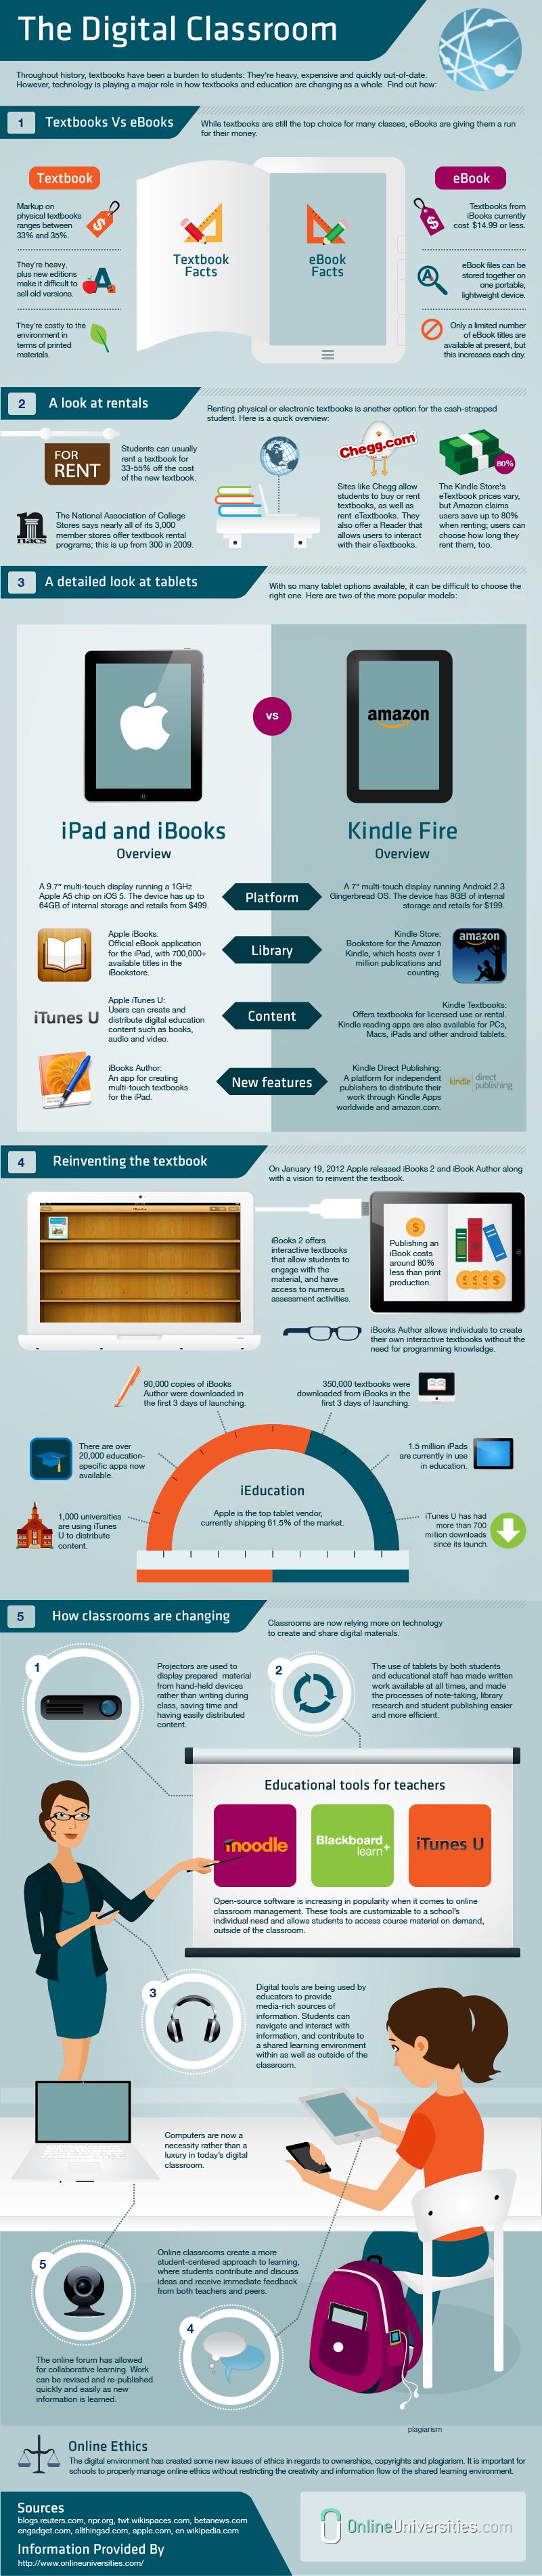 eBooks in the Digital Classroom